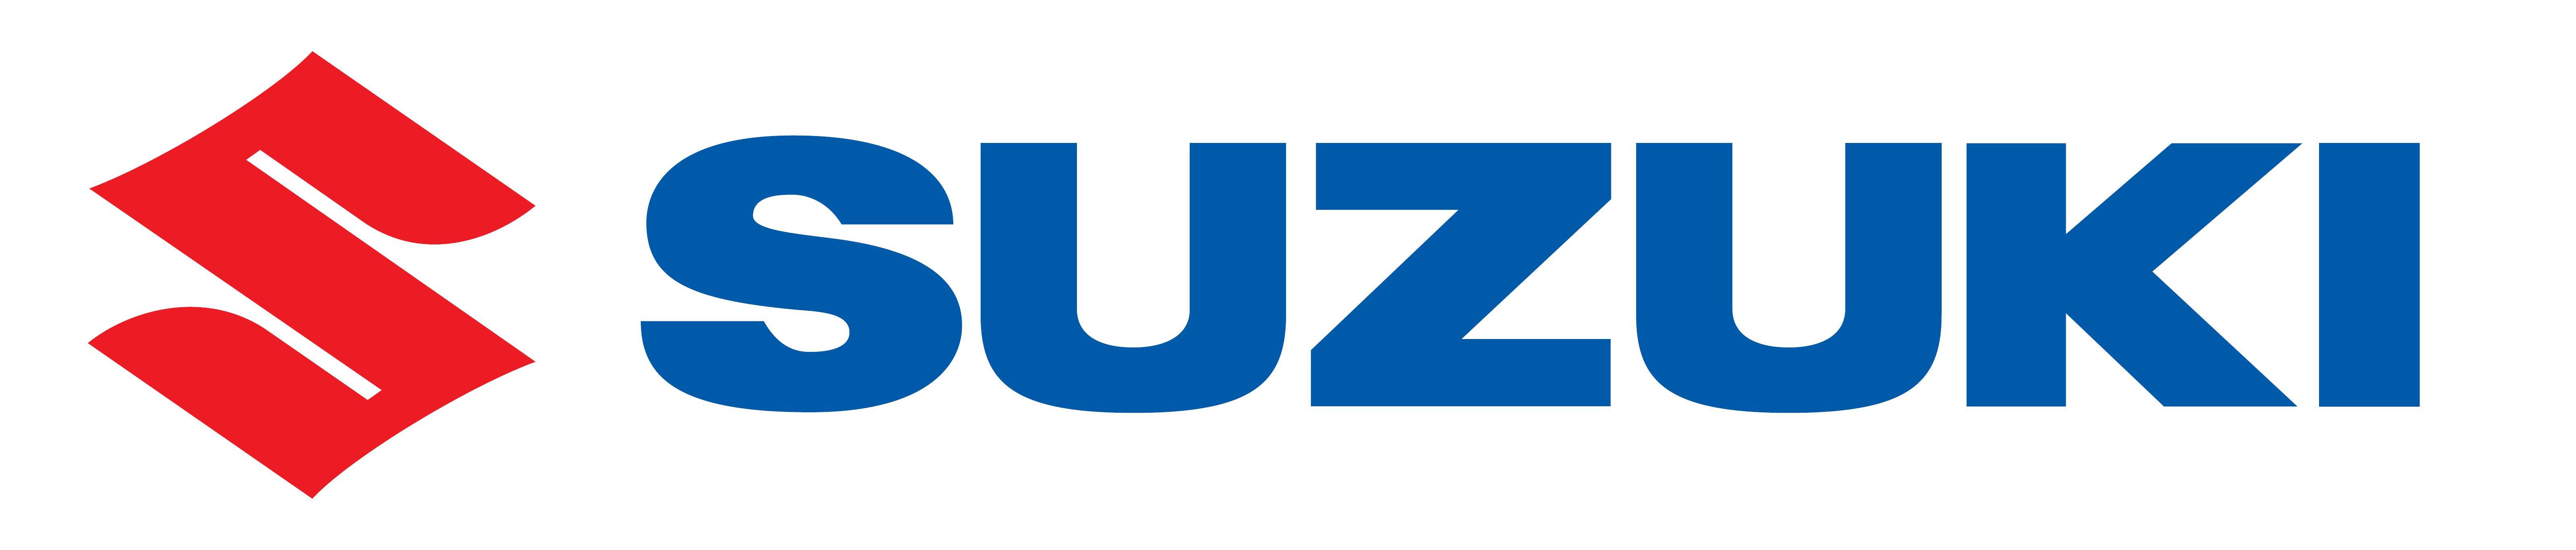 suzuki-logo-horizontal.jpeg